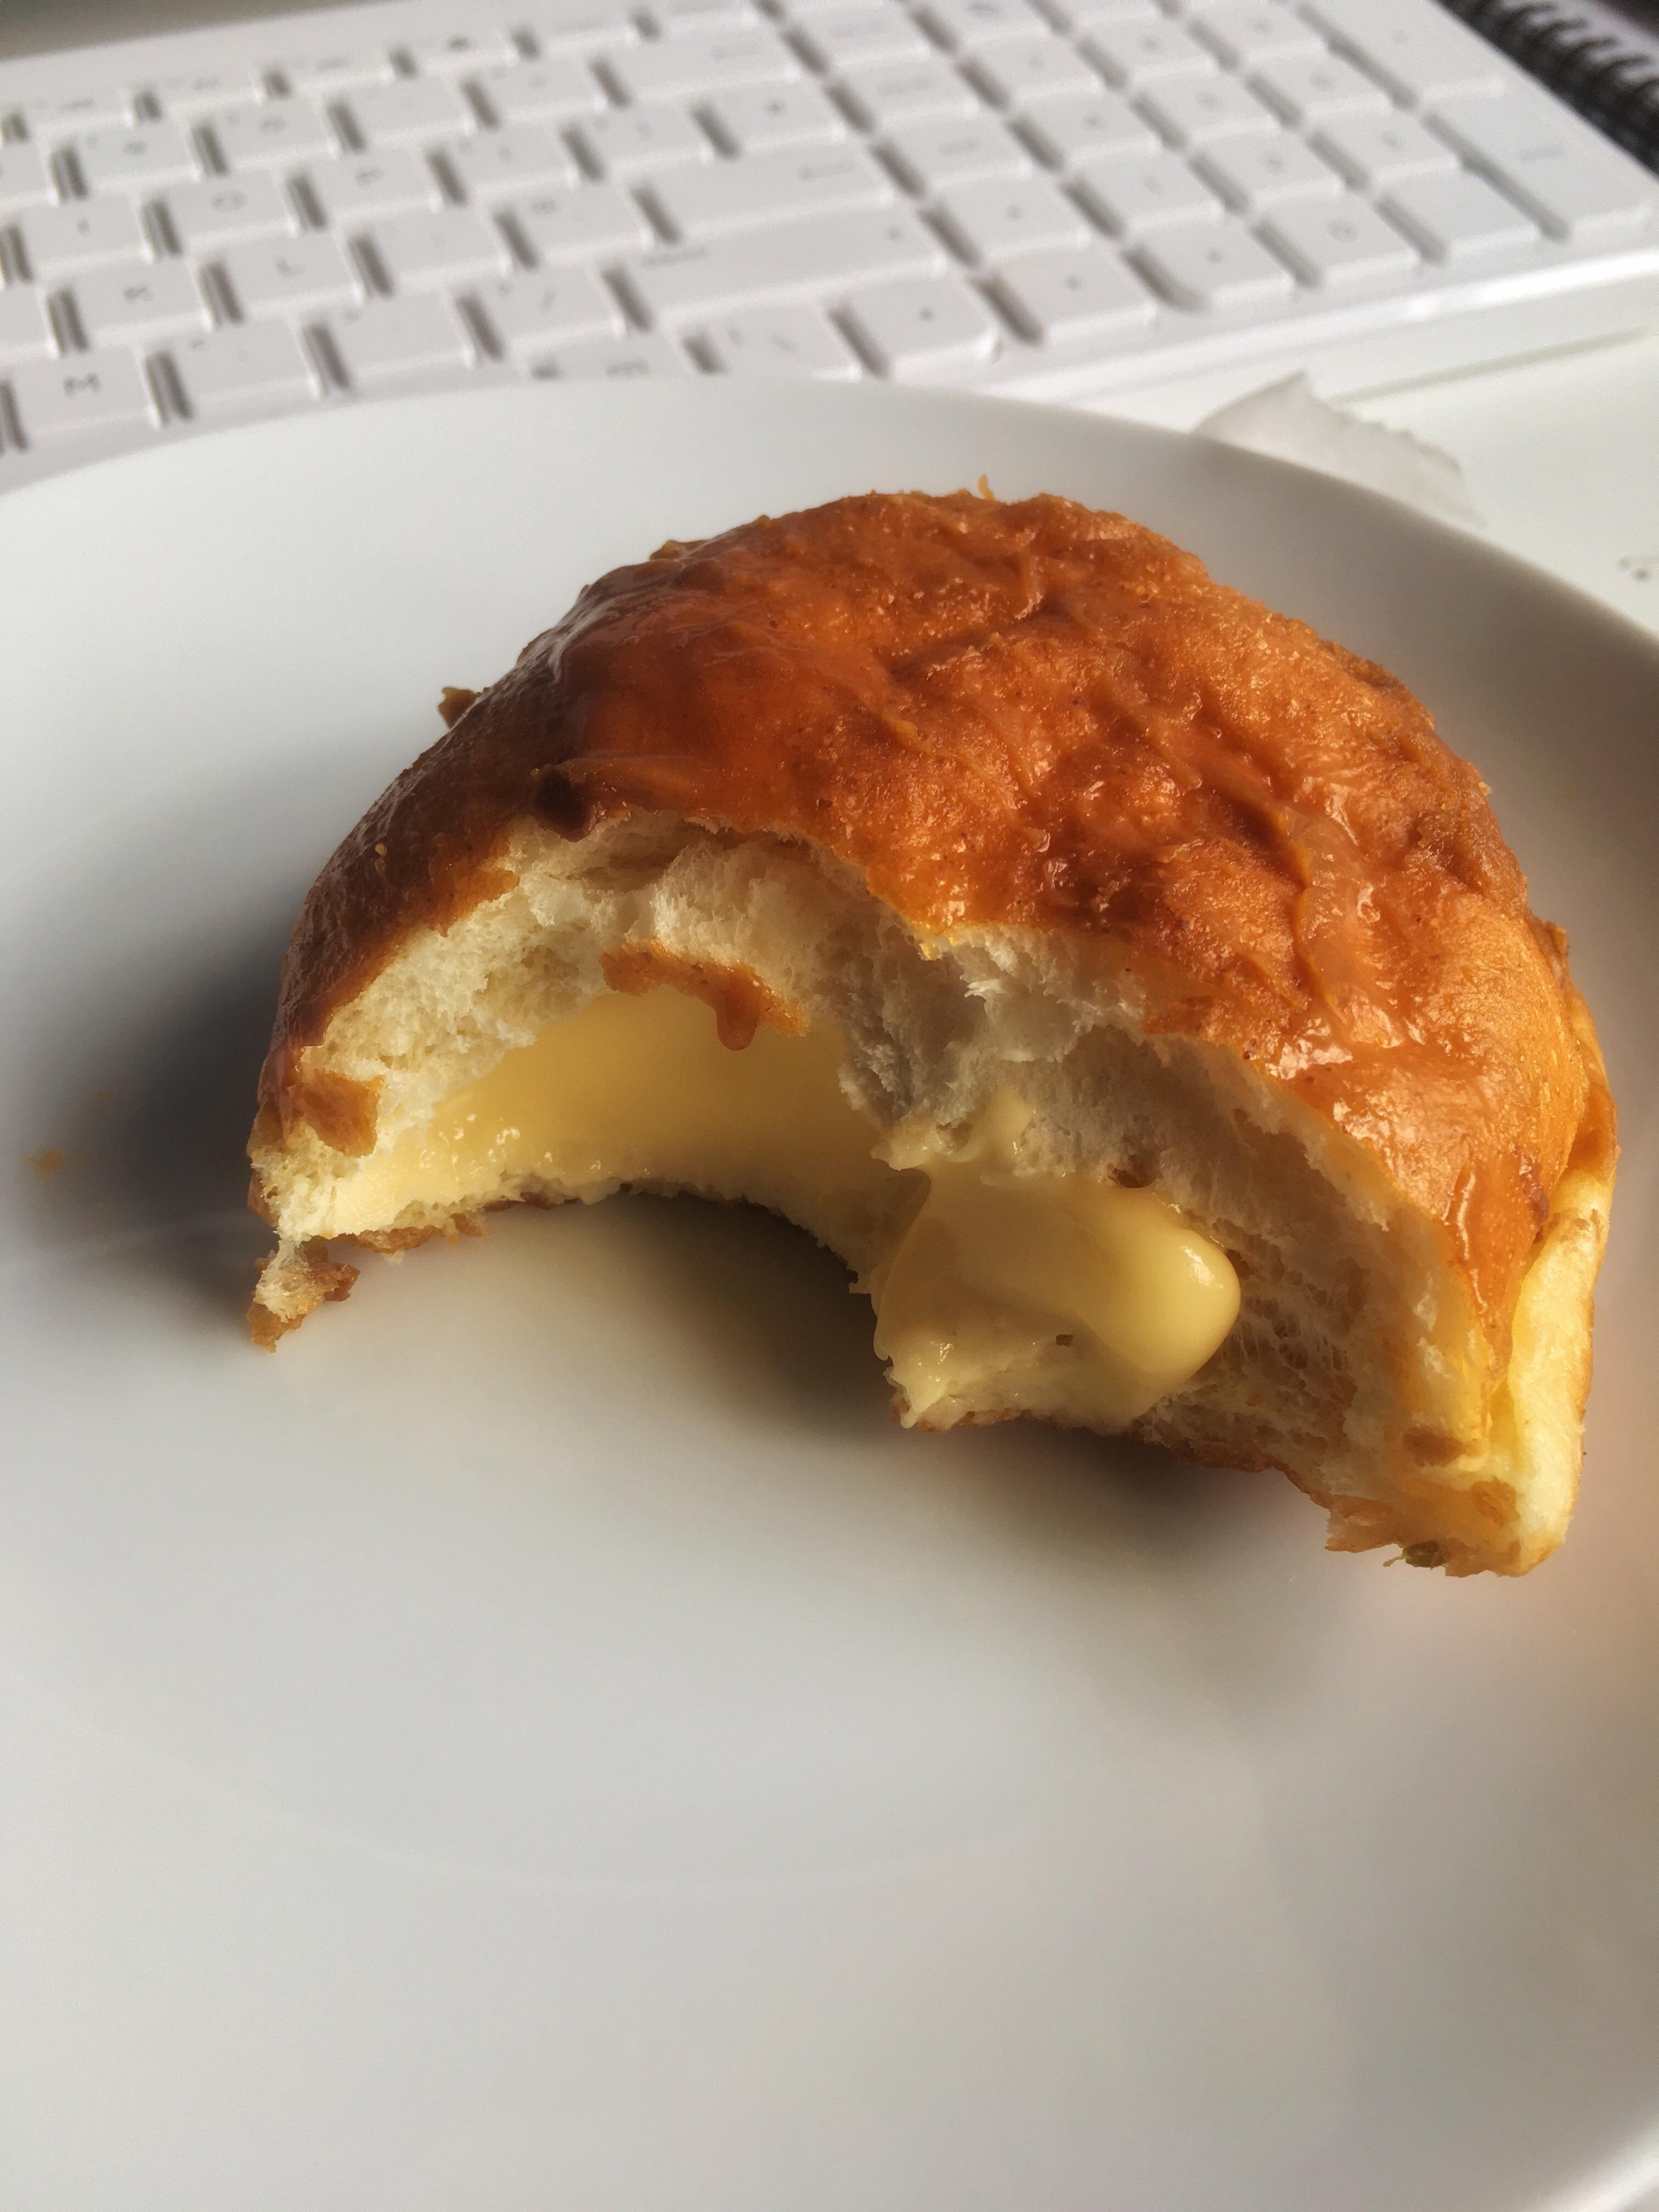 Greggs caramel custard donut, half bitten showing the rich creamy custard centre